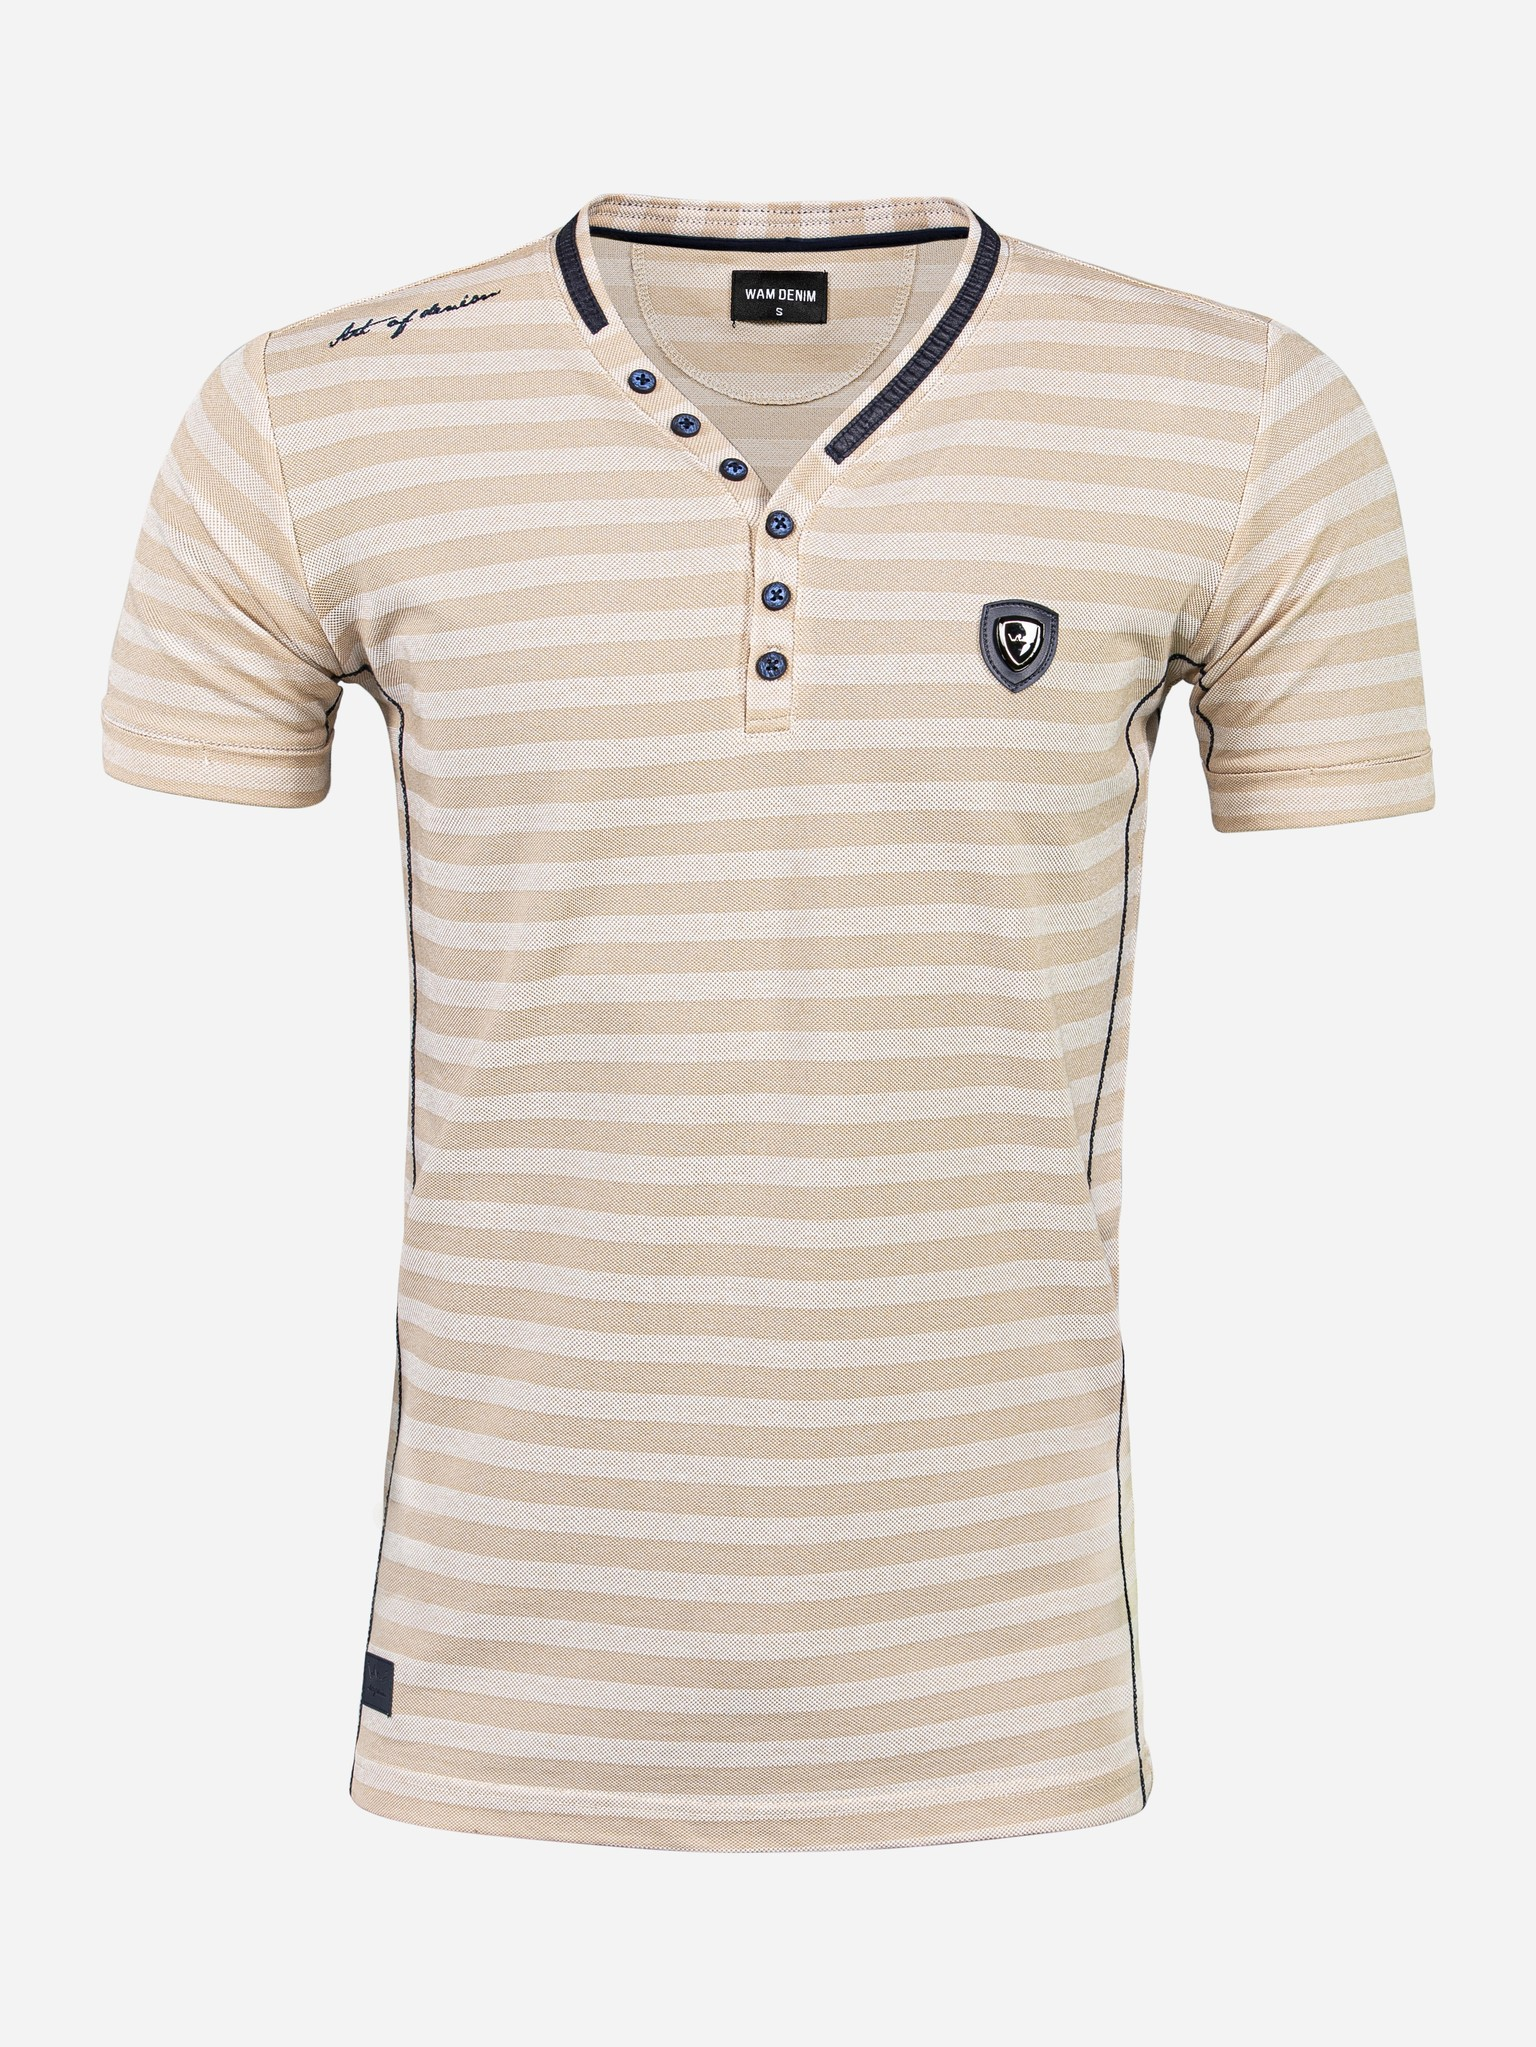 Wam Denim T-Shirt  Maat: XL